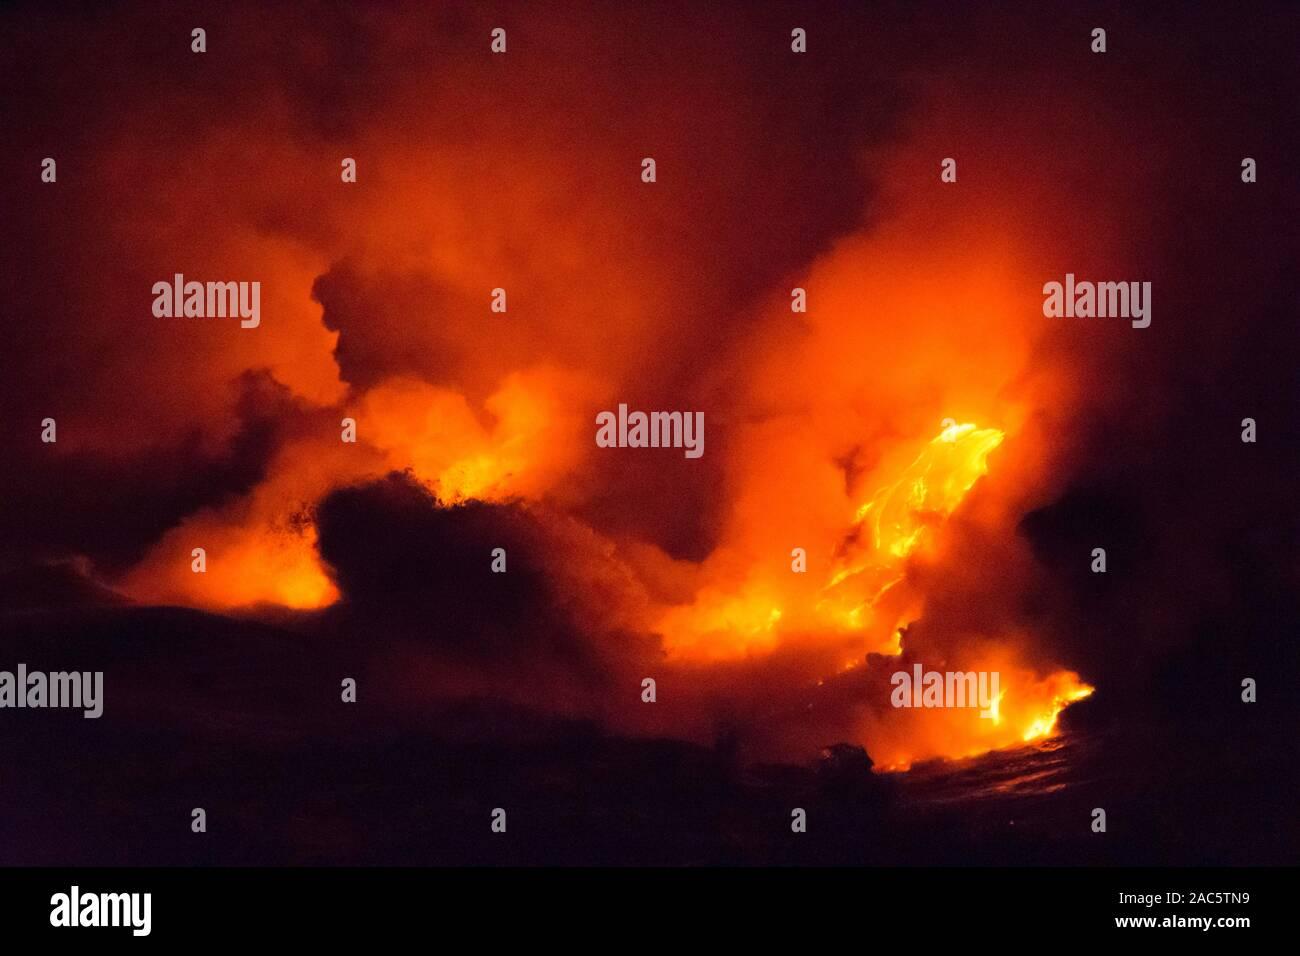 Lava del volcán Kilauea que desemboca en el mar cerca de Kalapana en la Isla Grande de Hawai'i. La Diosa Pele dice muchas historias a través de estos beauté Foto de stock